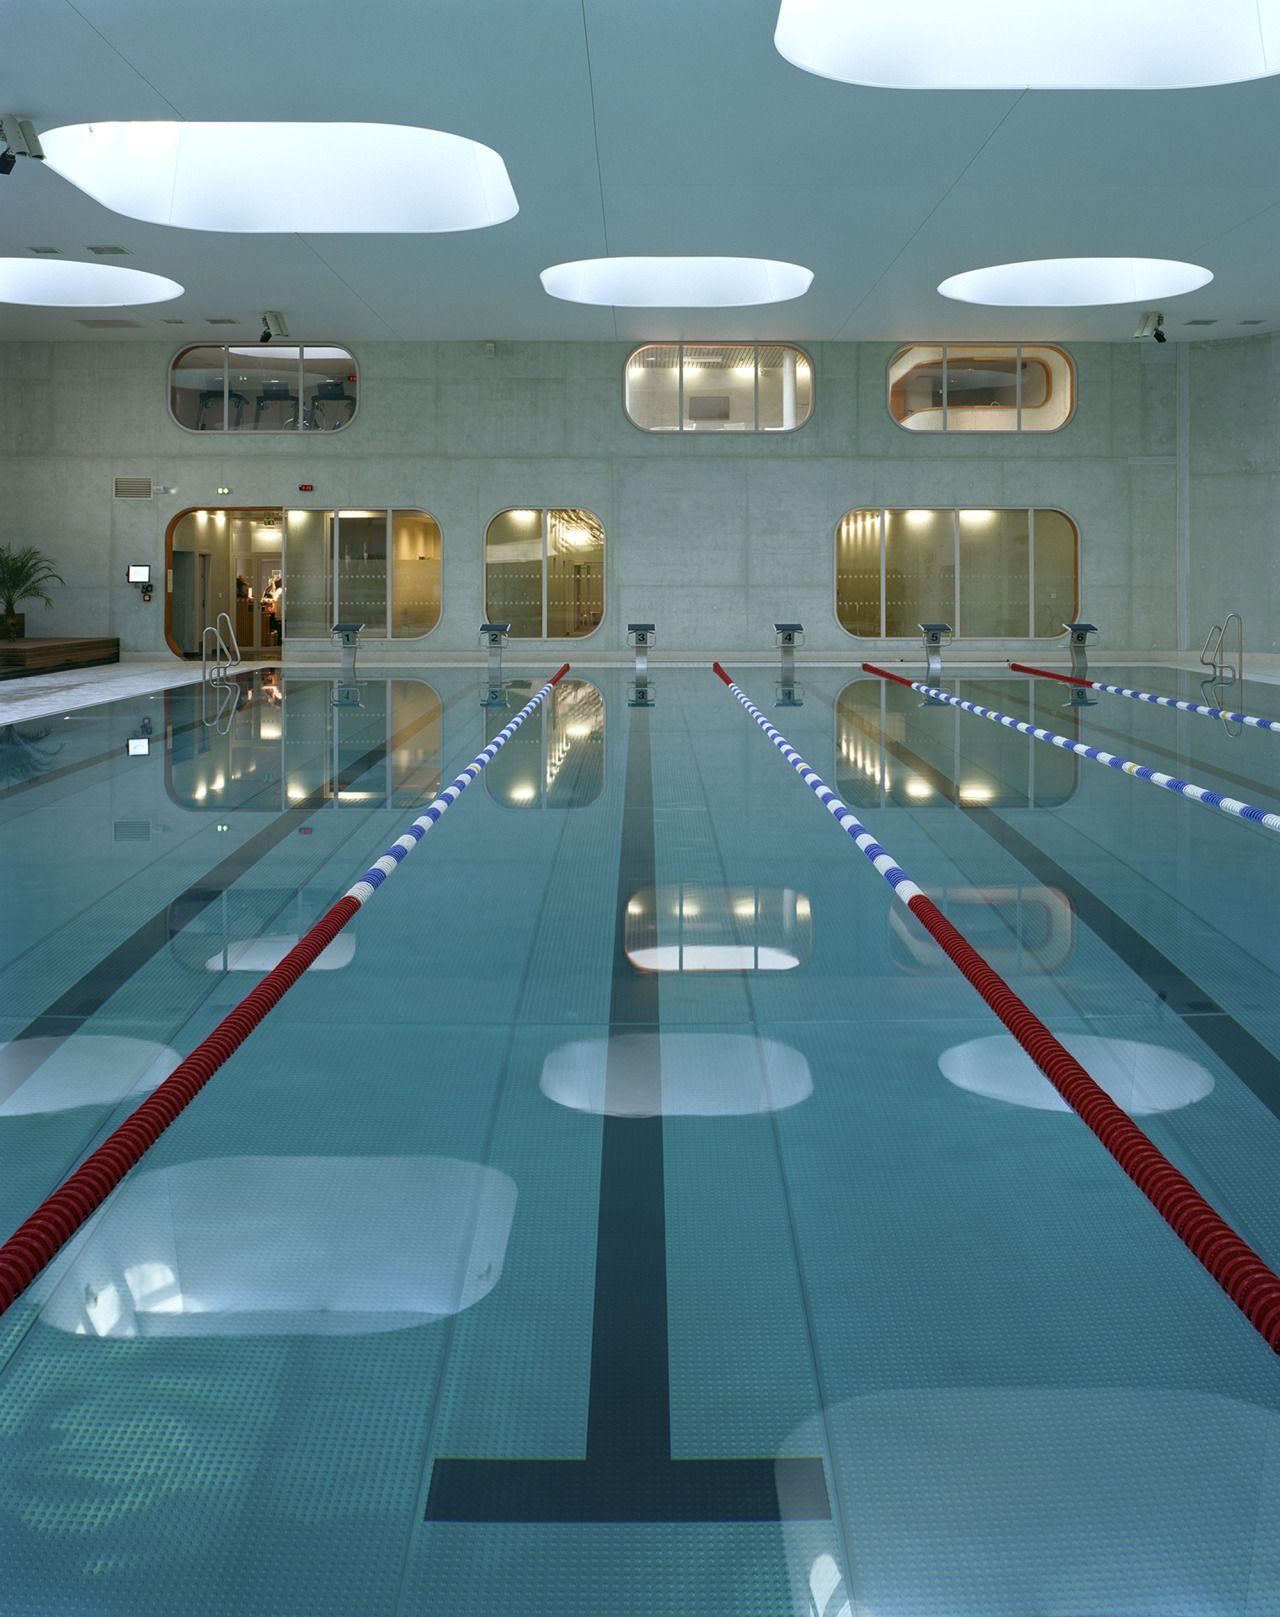 Dezeen Mikou Studio Bases Paris Swimming Pool On Feng Shui